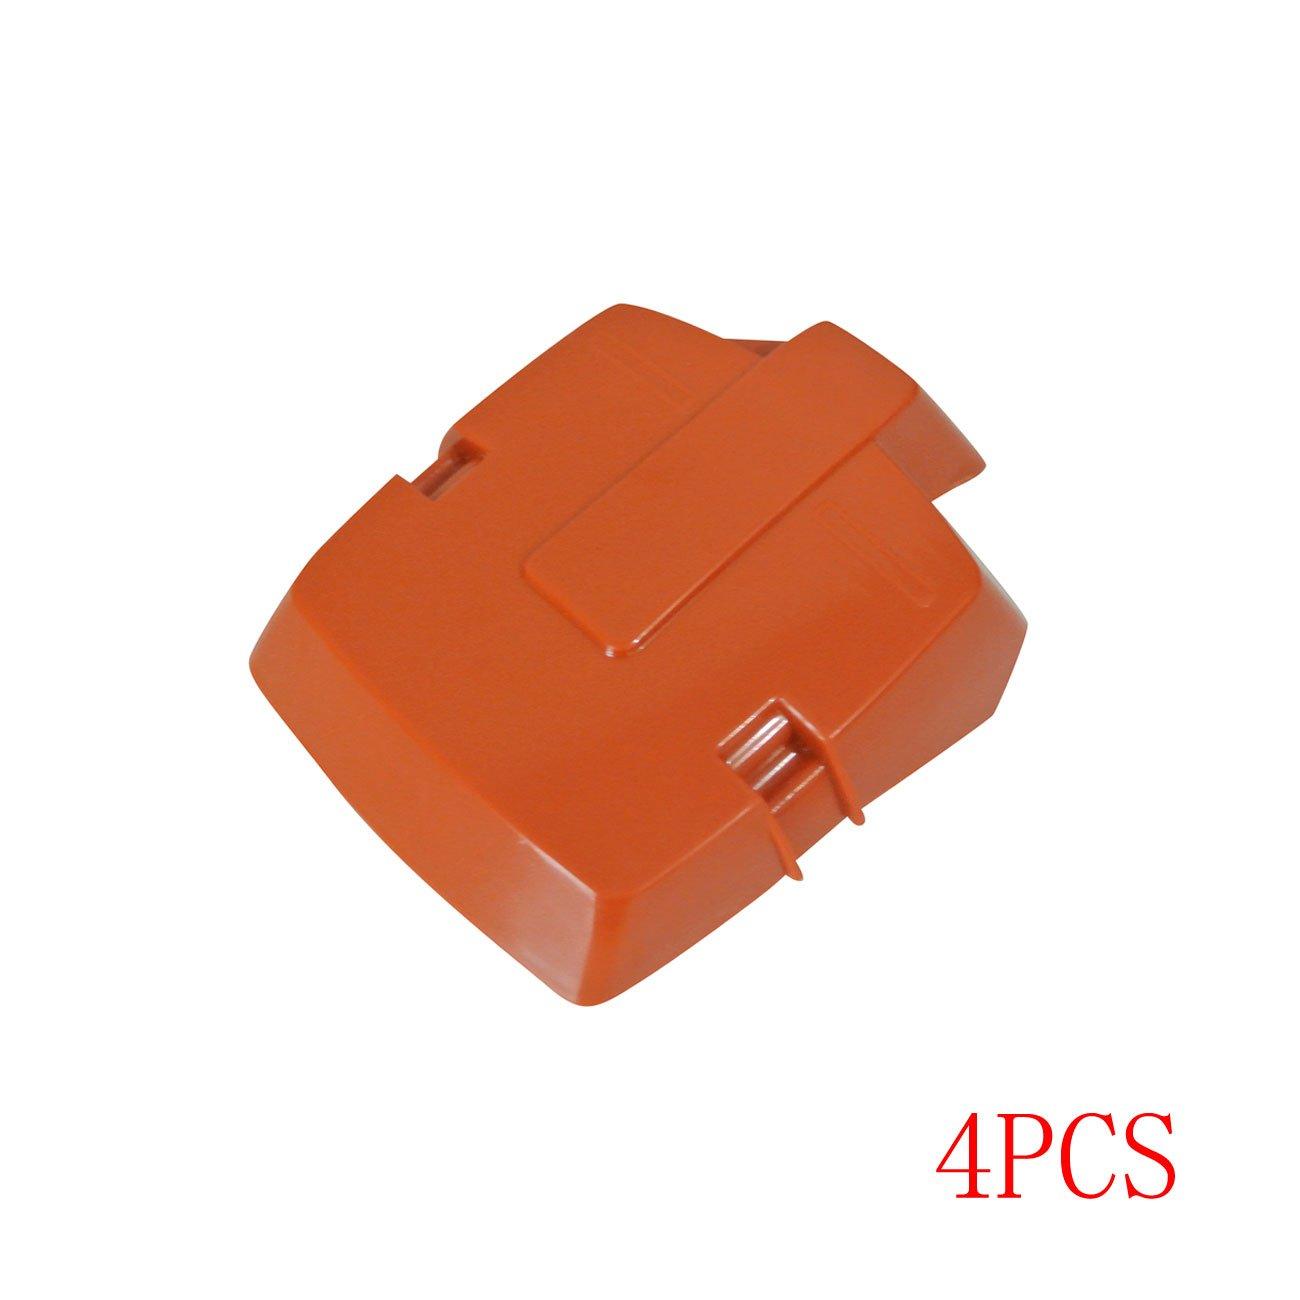 /01 jrl 4pcs Nueva cubierta del filtro de aire para Husqvarna 362/365/371/372/motosierras OEM # 503/62/80/